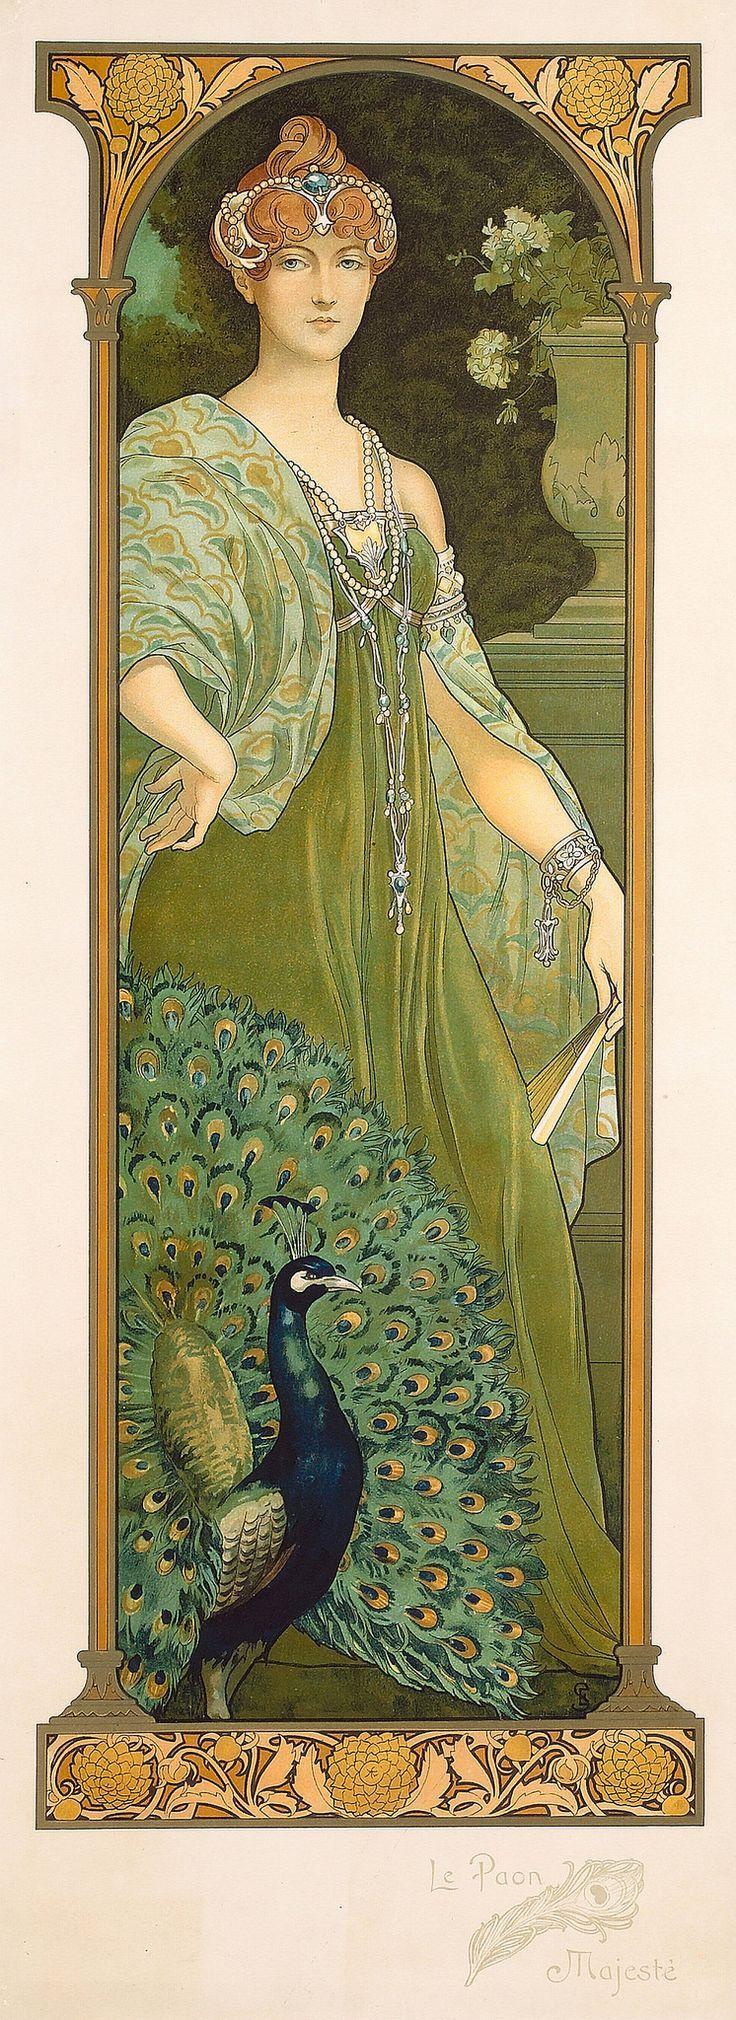 Le Paon - Majeste (Elisabeth Sonrel)